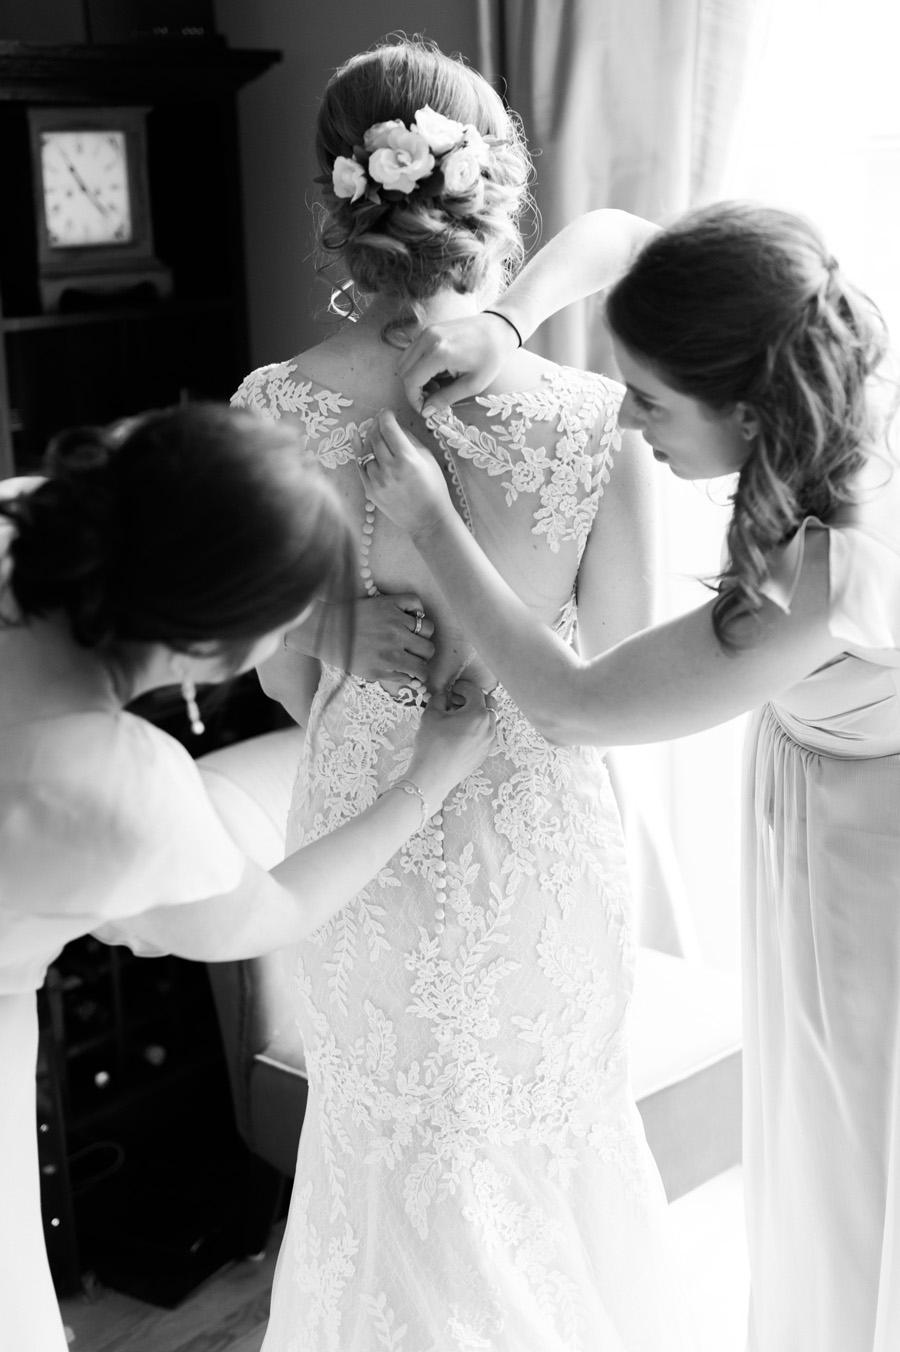 Bridesmaids helping bride get in her dress.